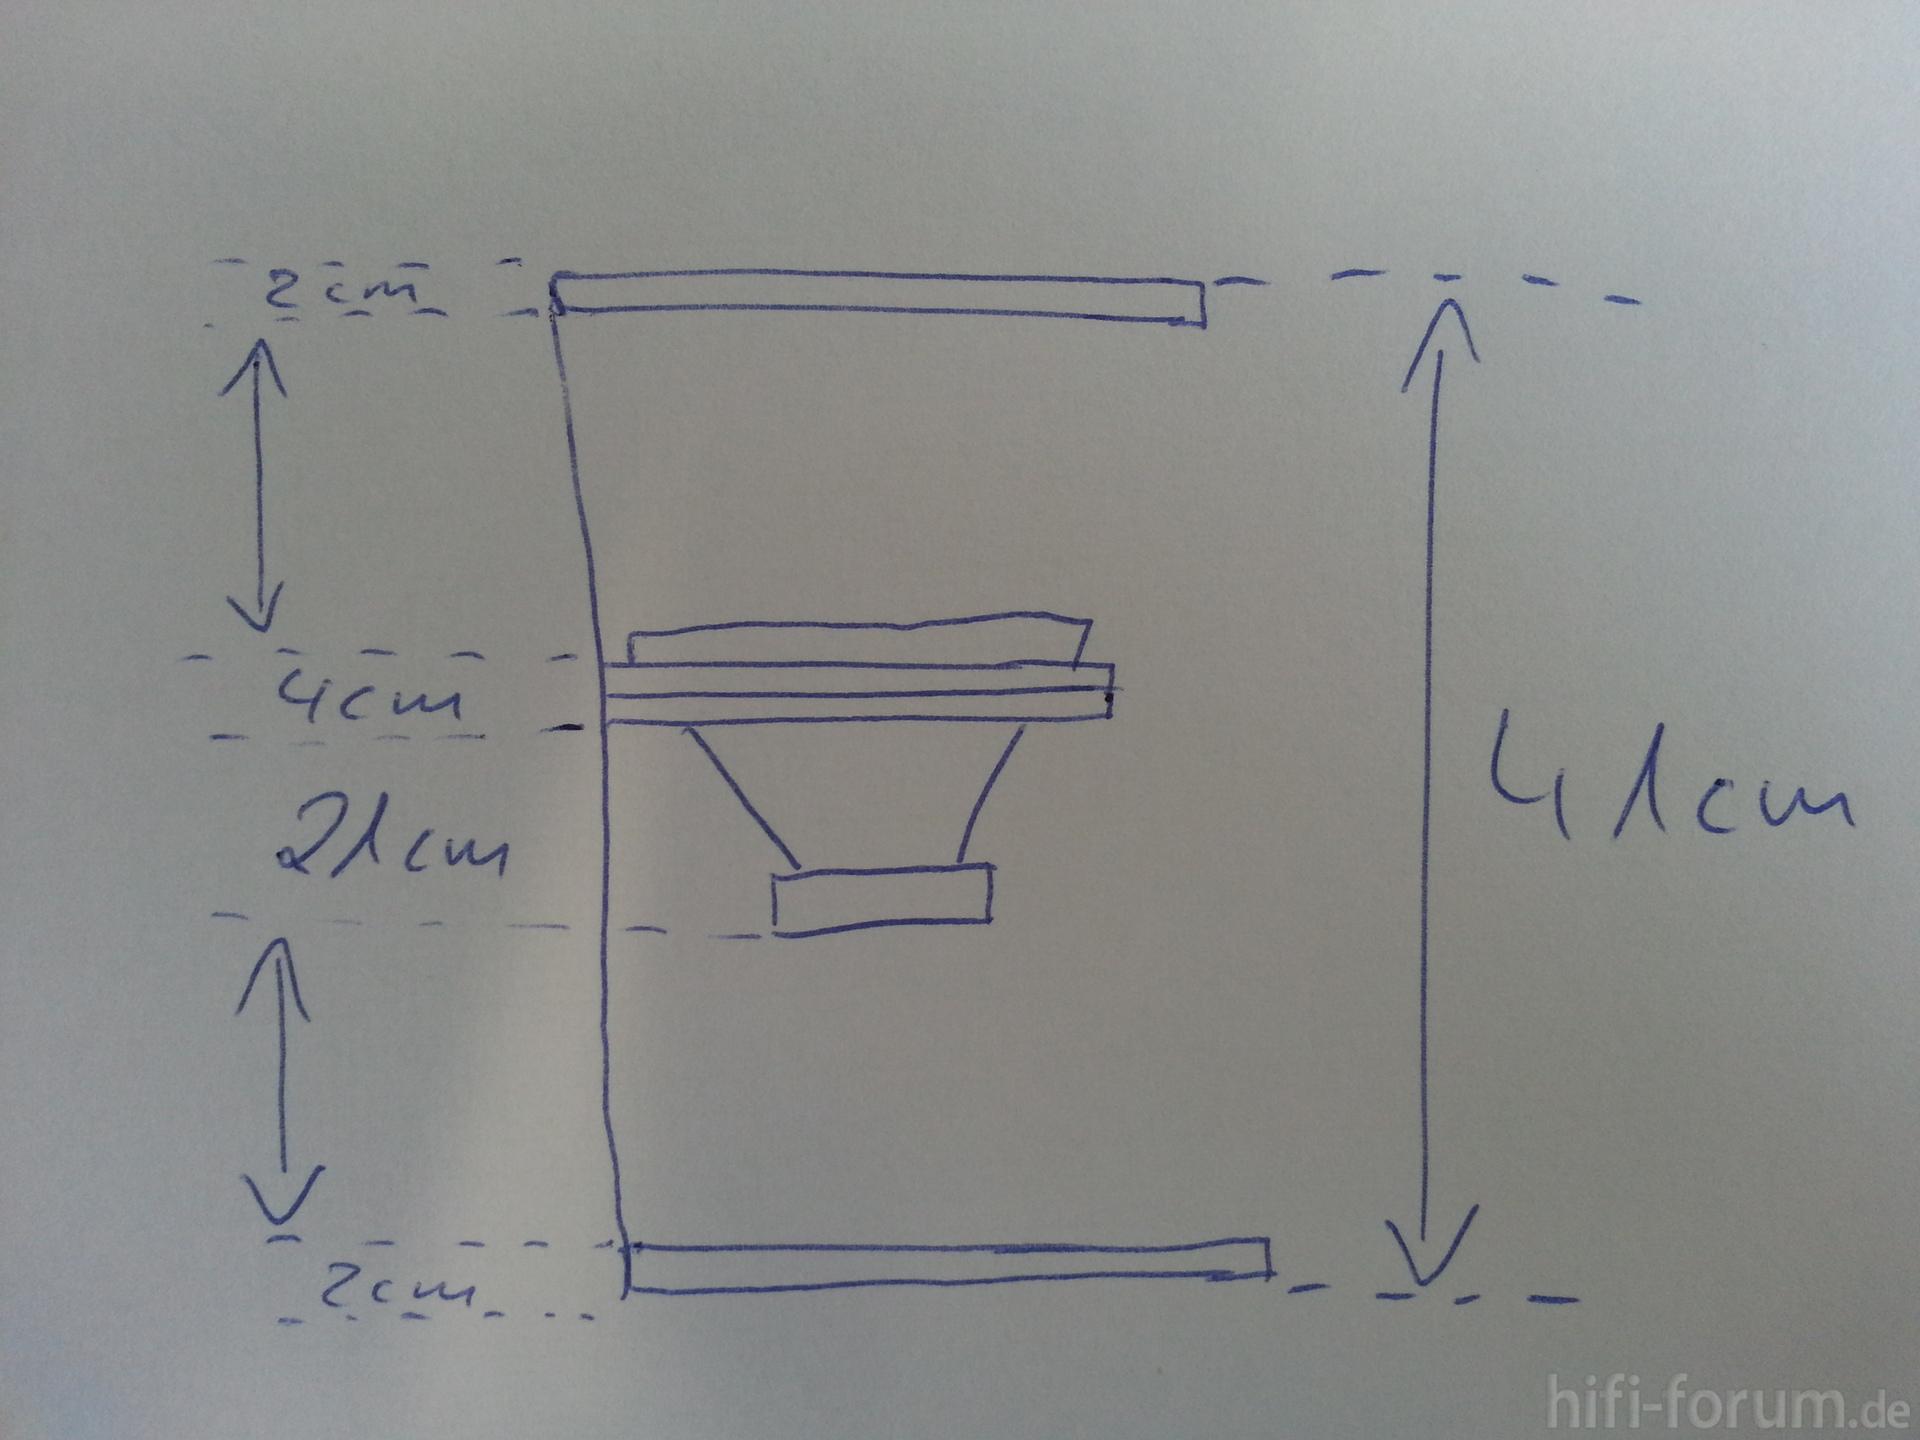 2013 05 22 12 57 22 carhifi hifi bildergalerie. Black Bedroom Furniture Sets. Home Design Ideas